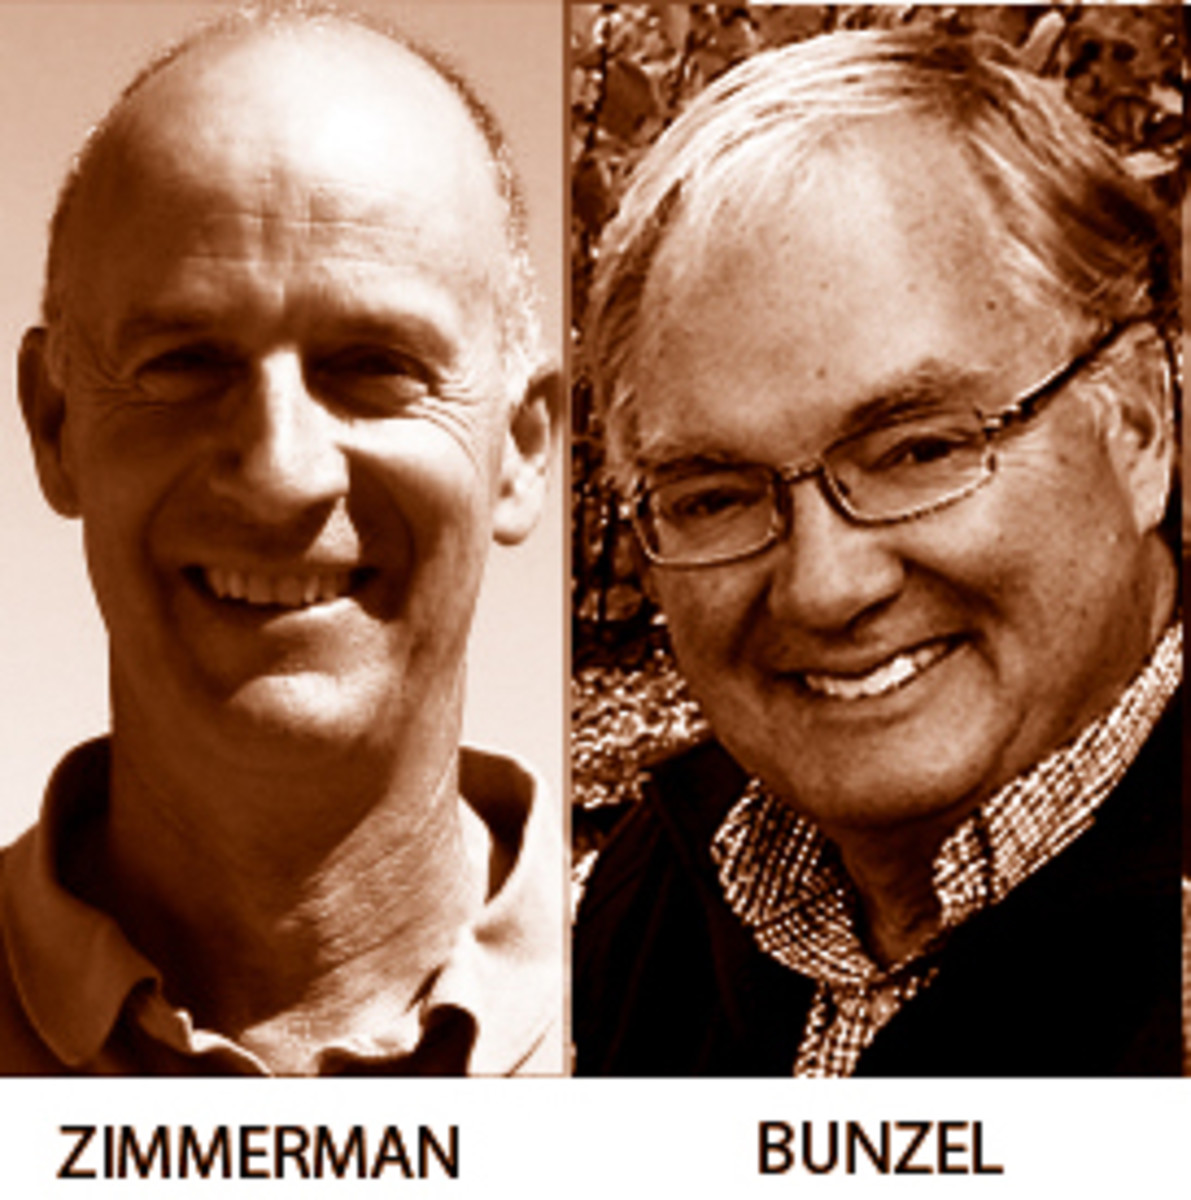 ZimmermanBunzel